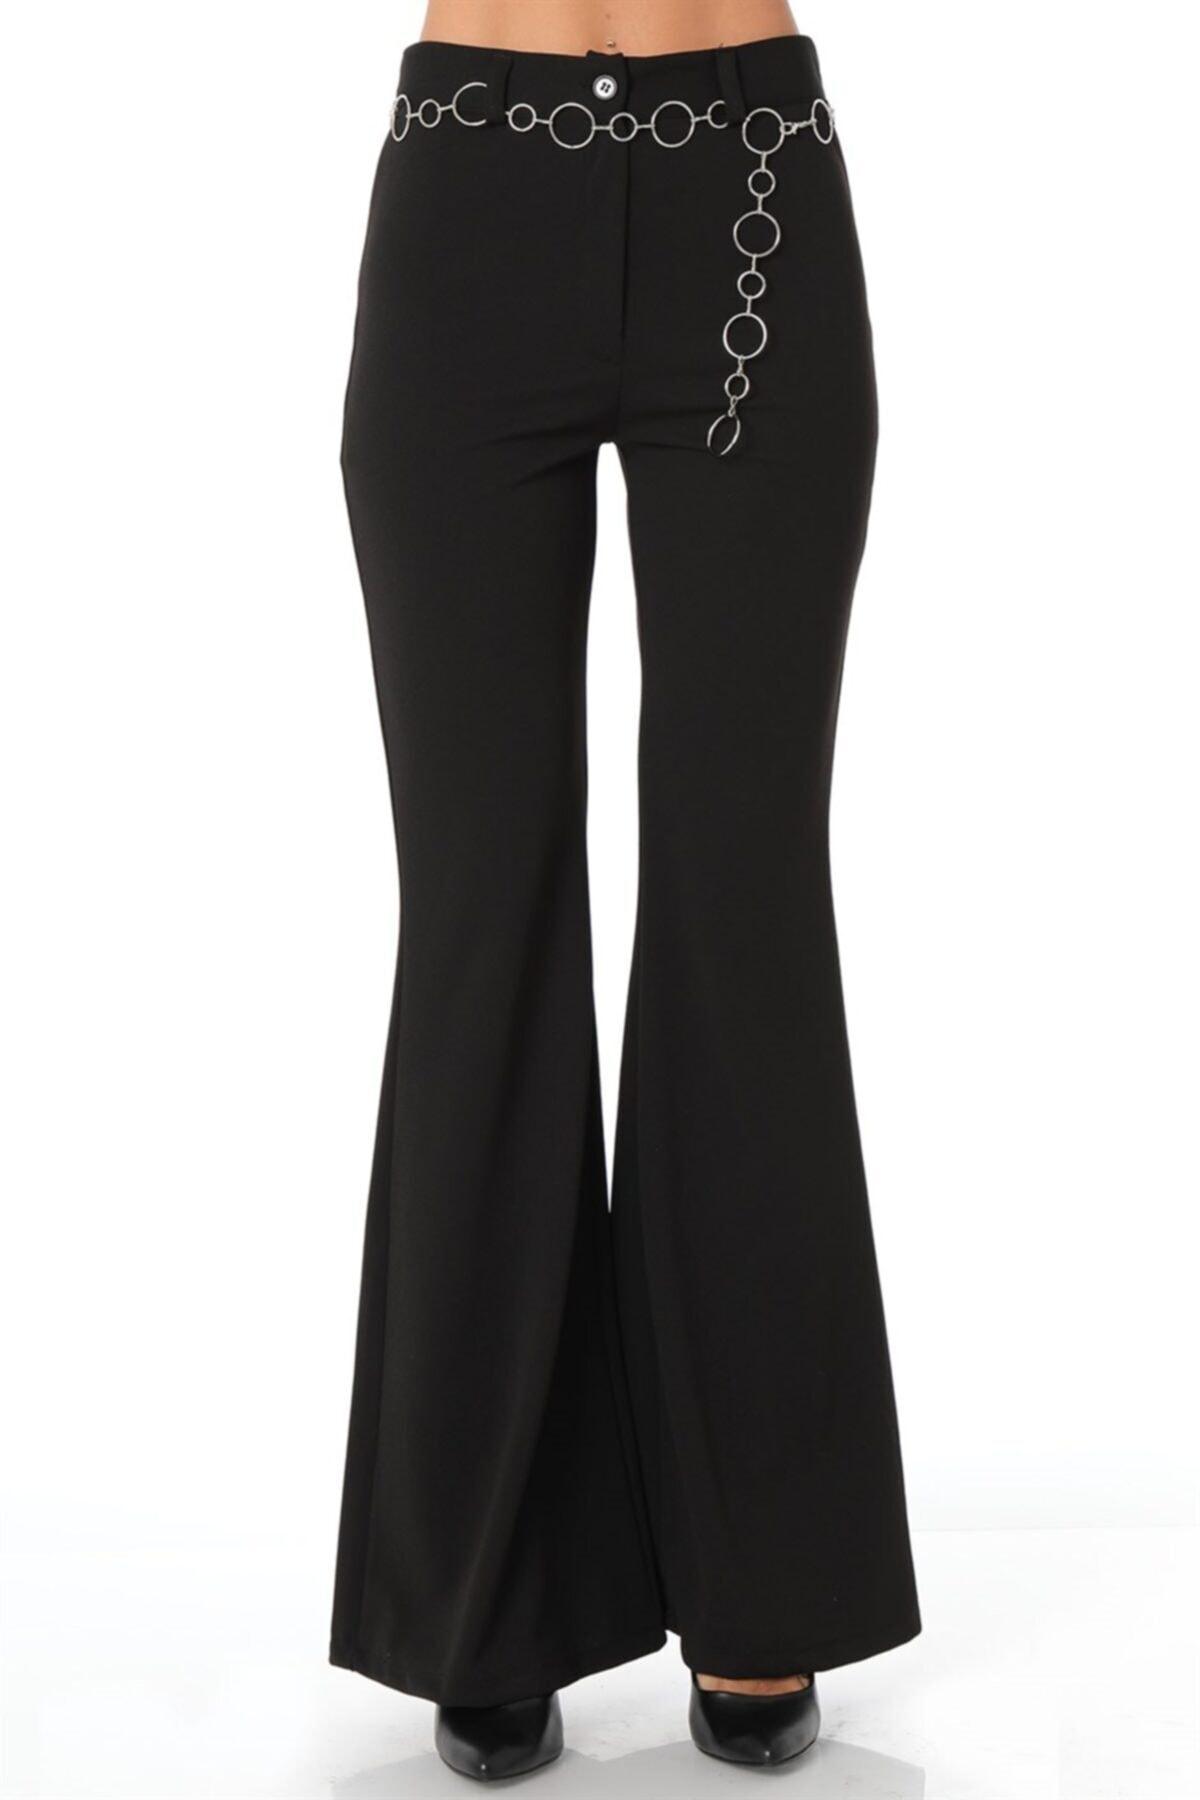 Ispanyol Paça Zincir Aksesuarlı Kumaş Pantolon - Siyah